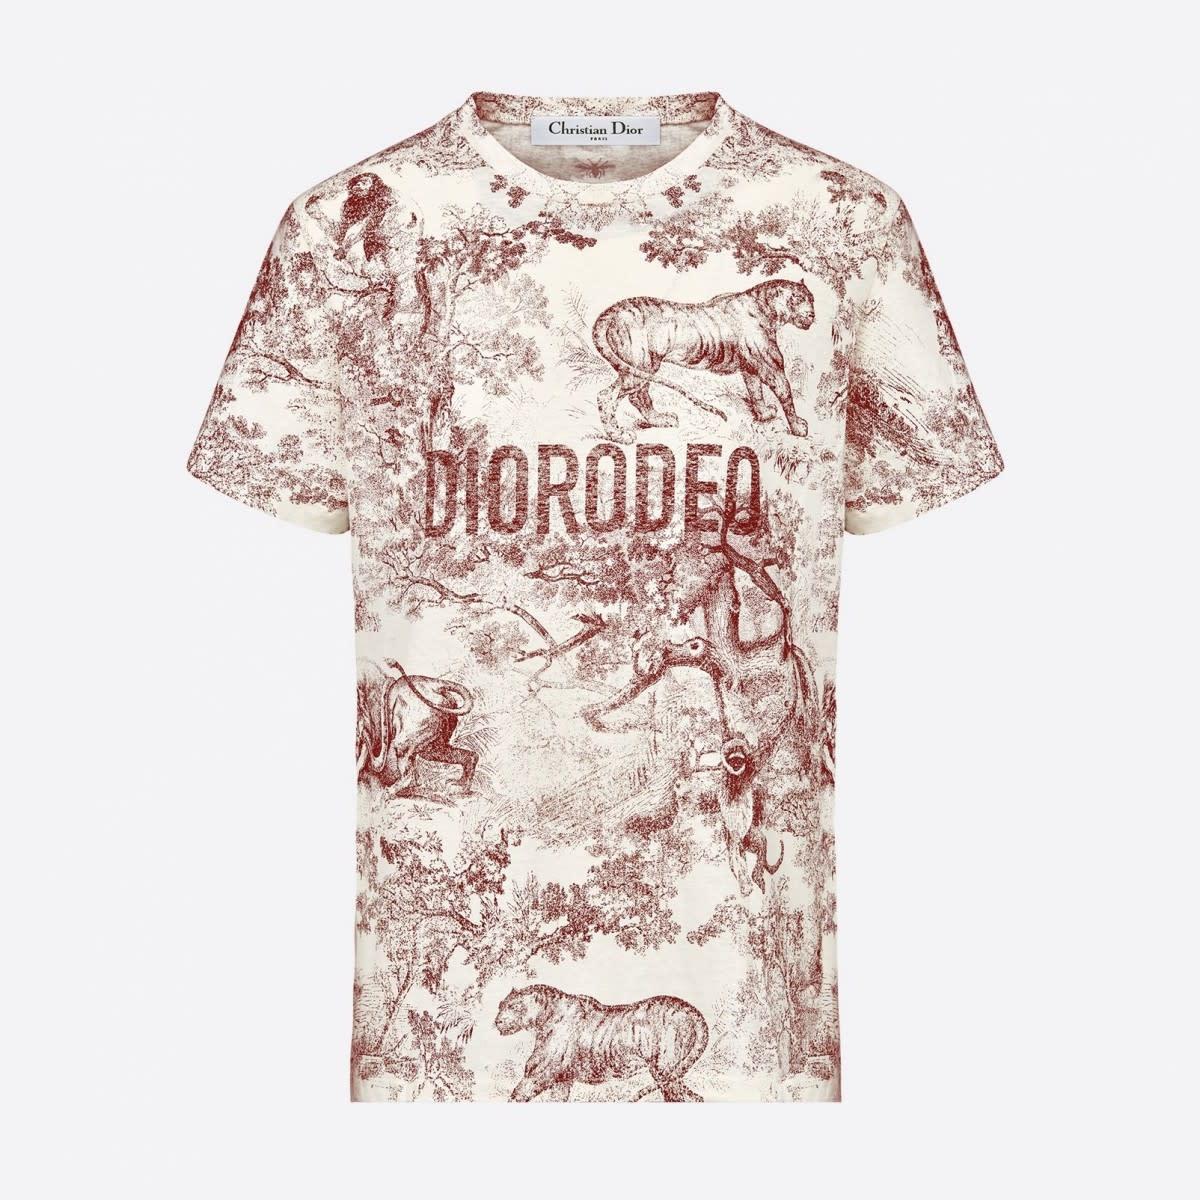 Where to shop DioRodeo shirt